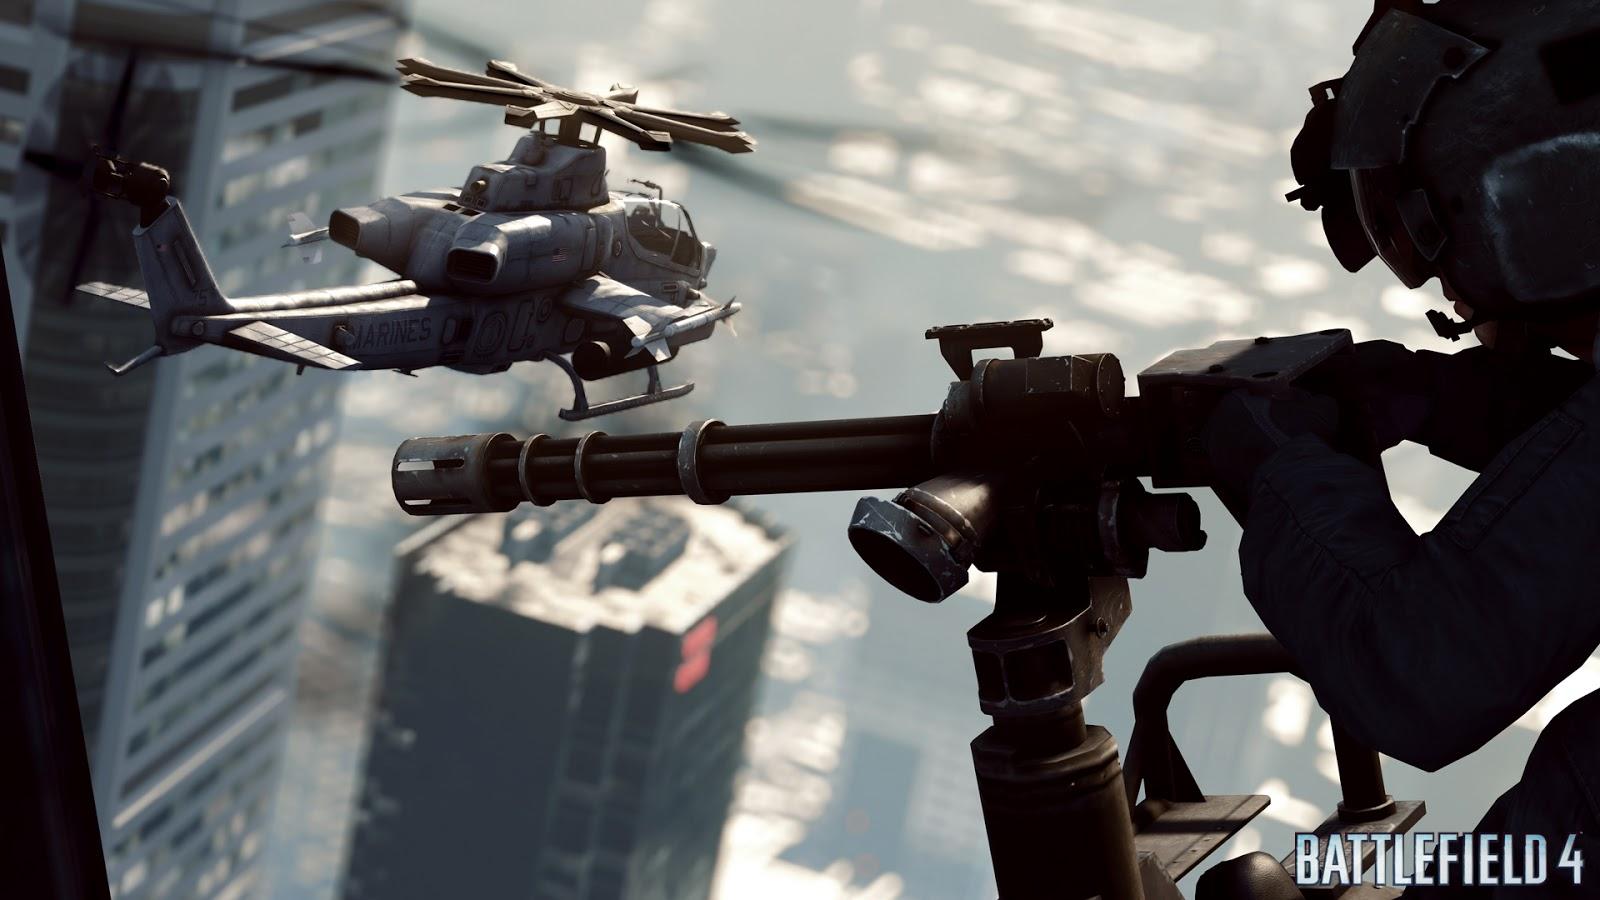 Battlefield 4 Siege of Shanghai HD desktop wallpaper High  - battlefield 4 siege of shanghai wallpapers